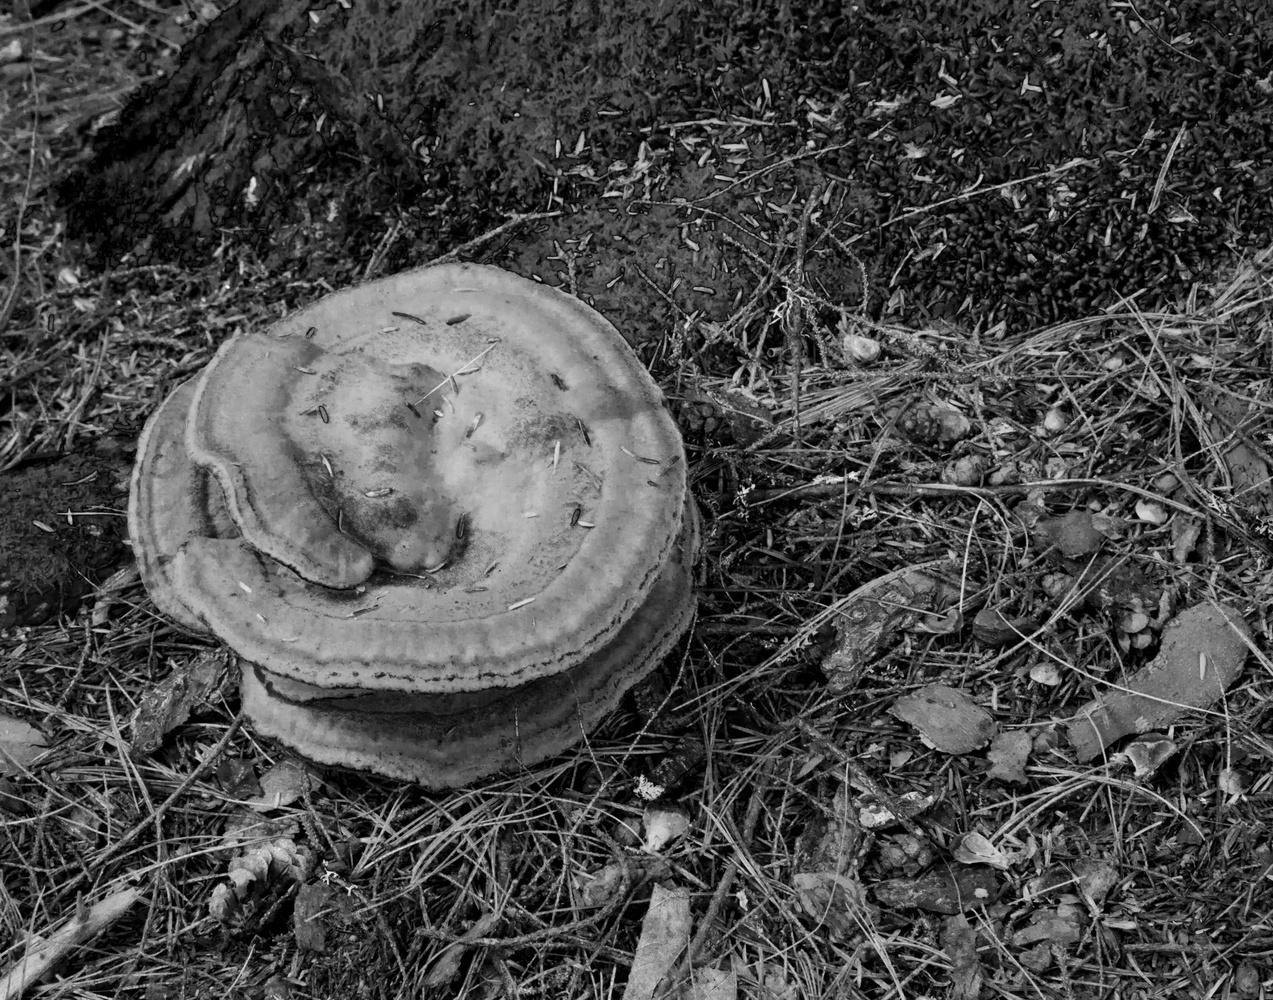 Large Swirl Mushroom by James Jewers